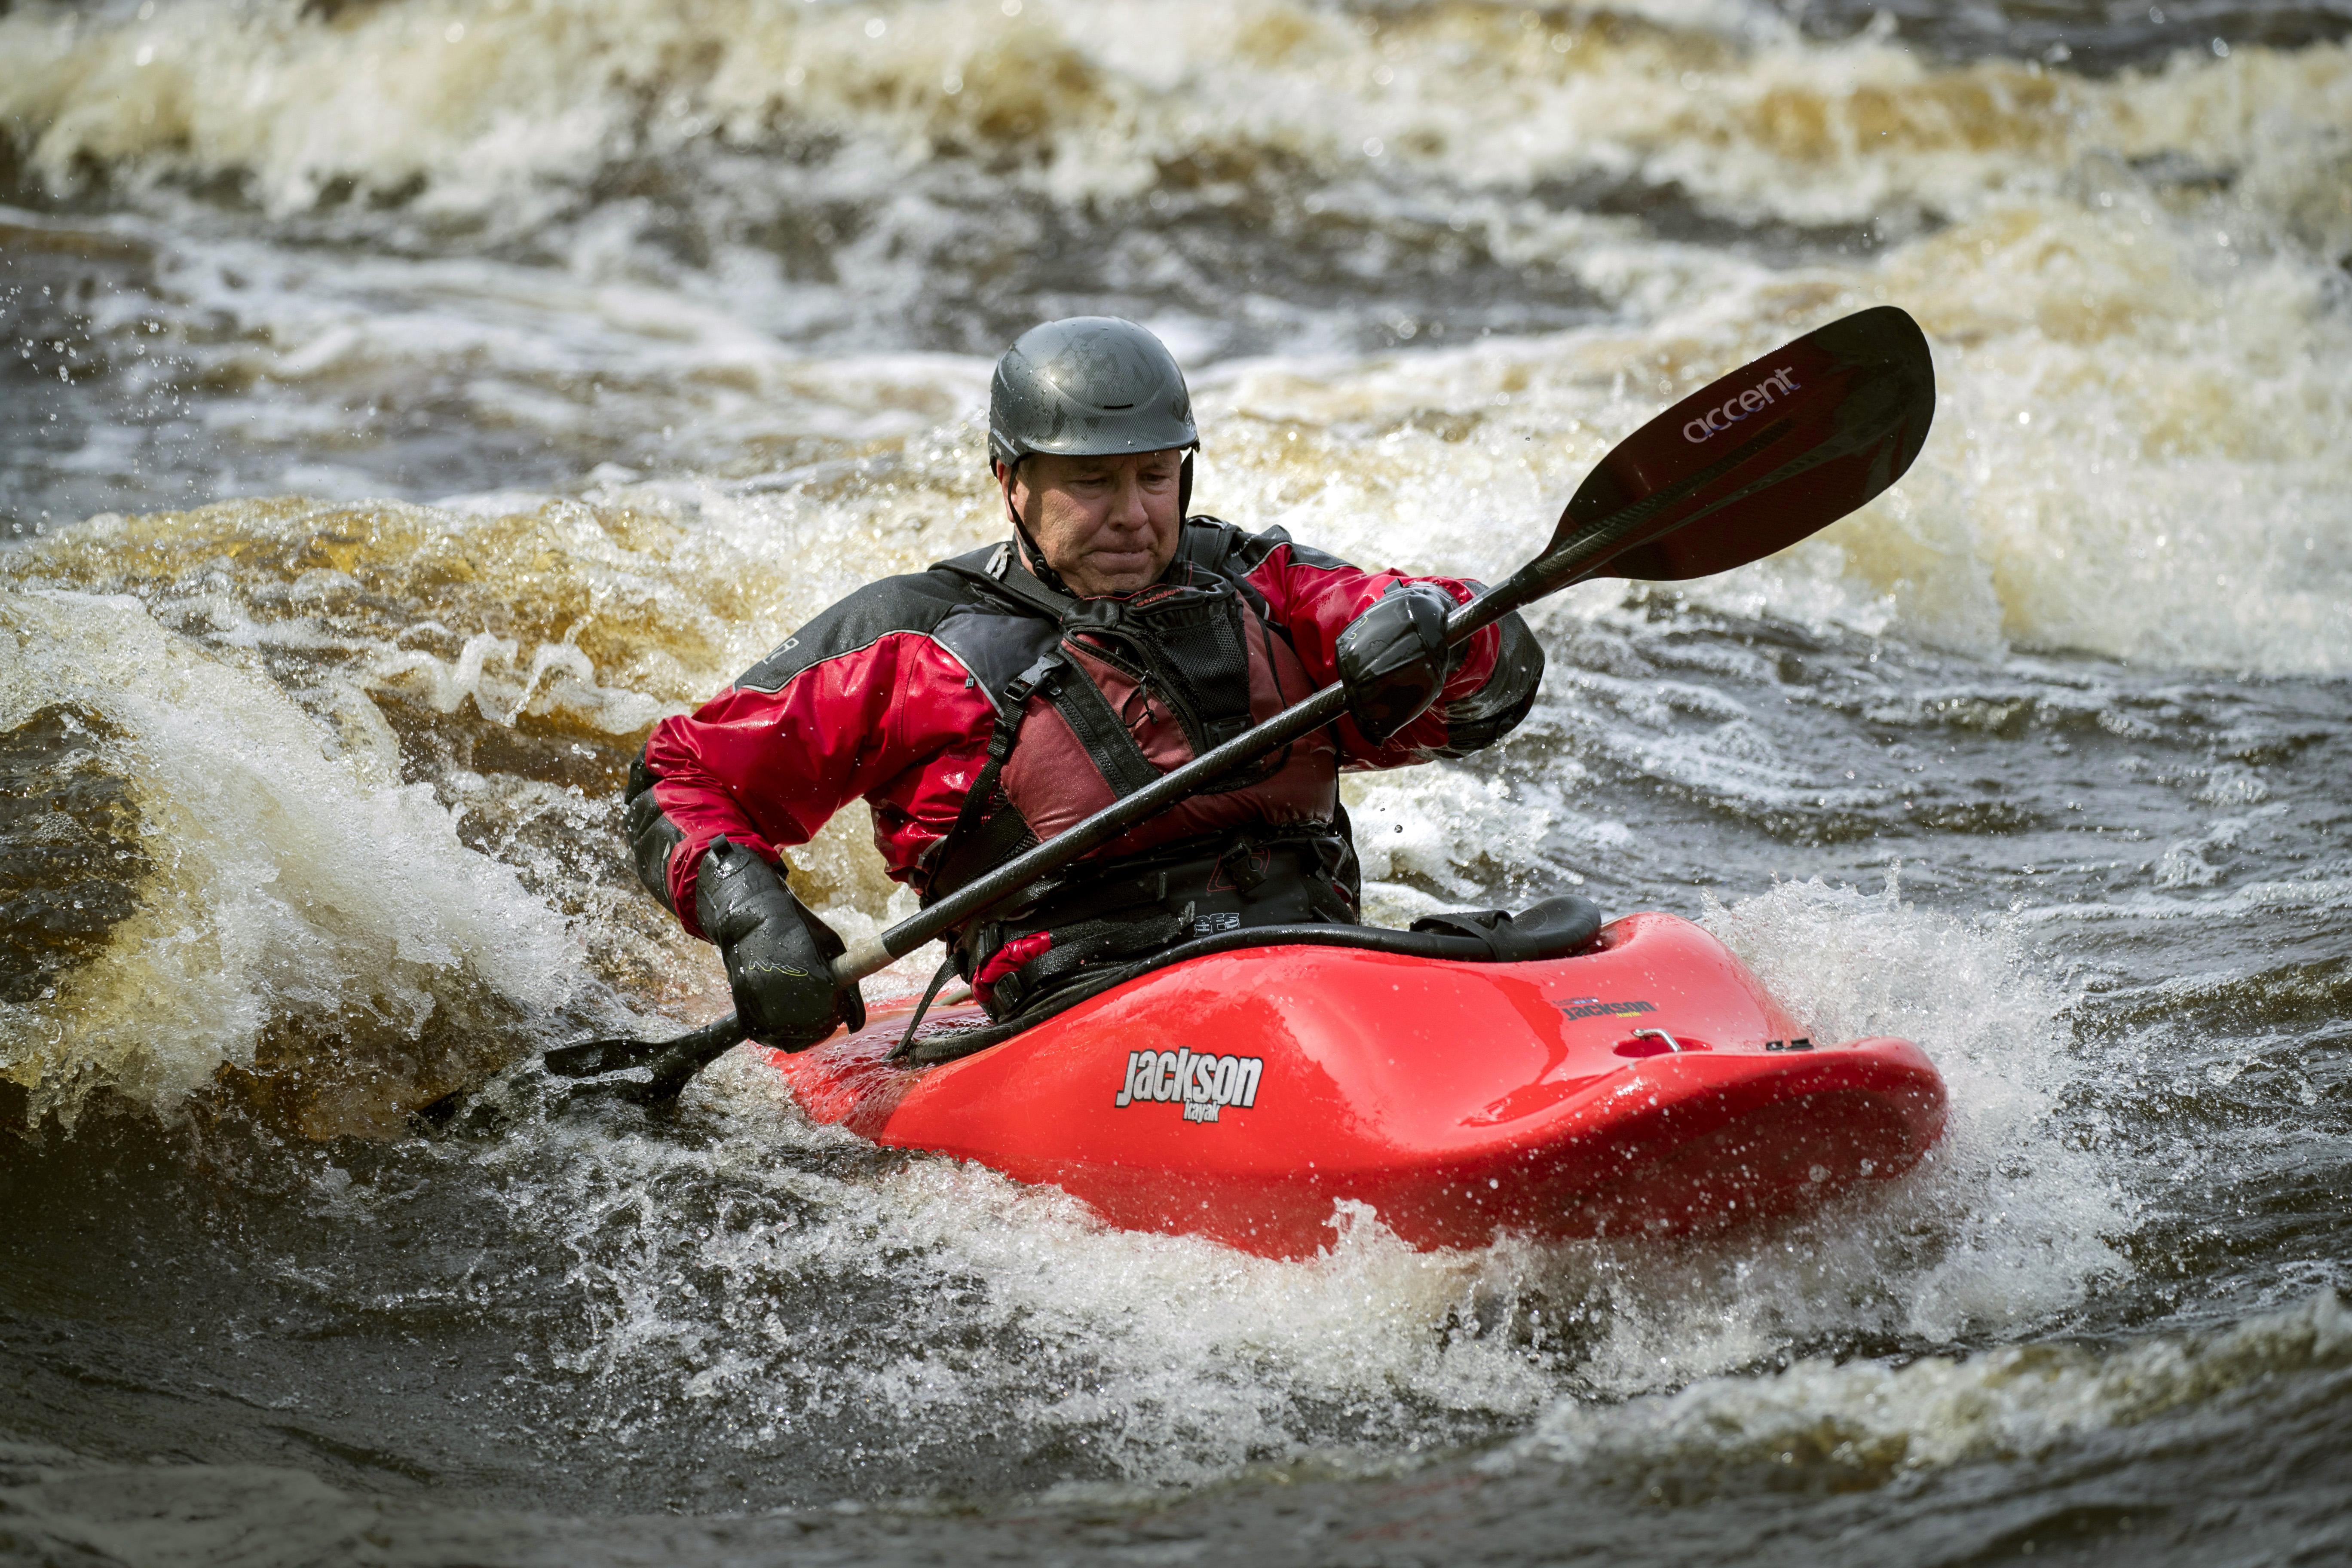 Jim Blake surfs the Blueberry Slide rapids on the Kettle River at Banning State Park.